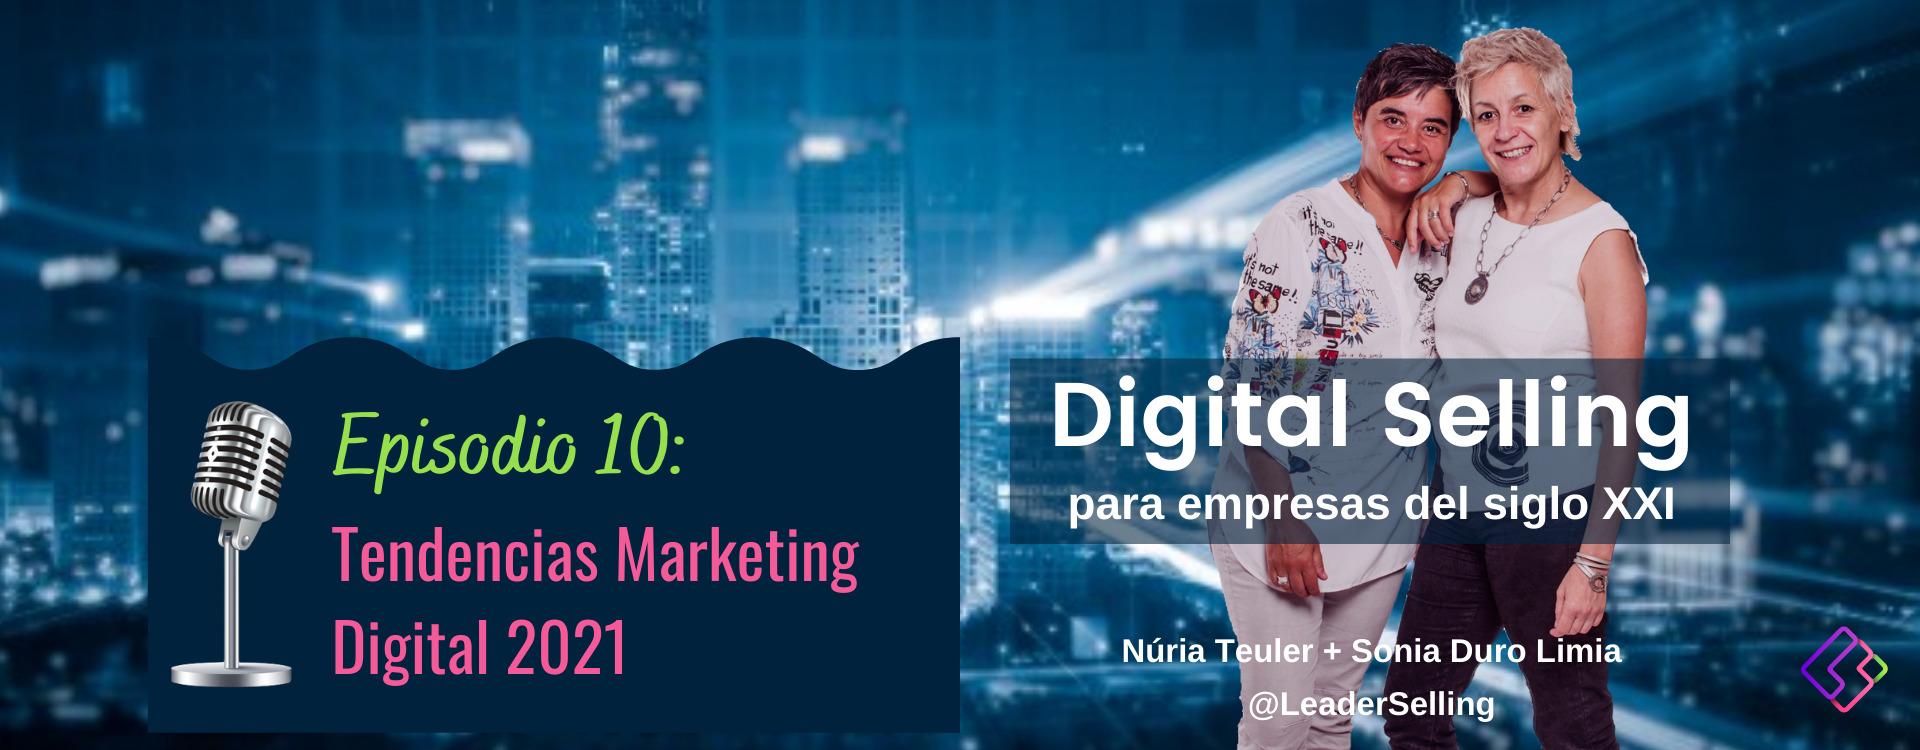 tendencias de marketing digital para 2021